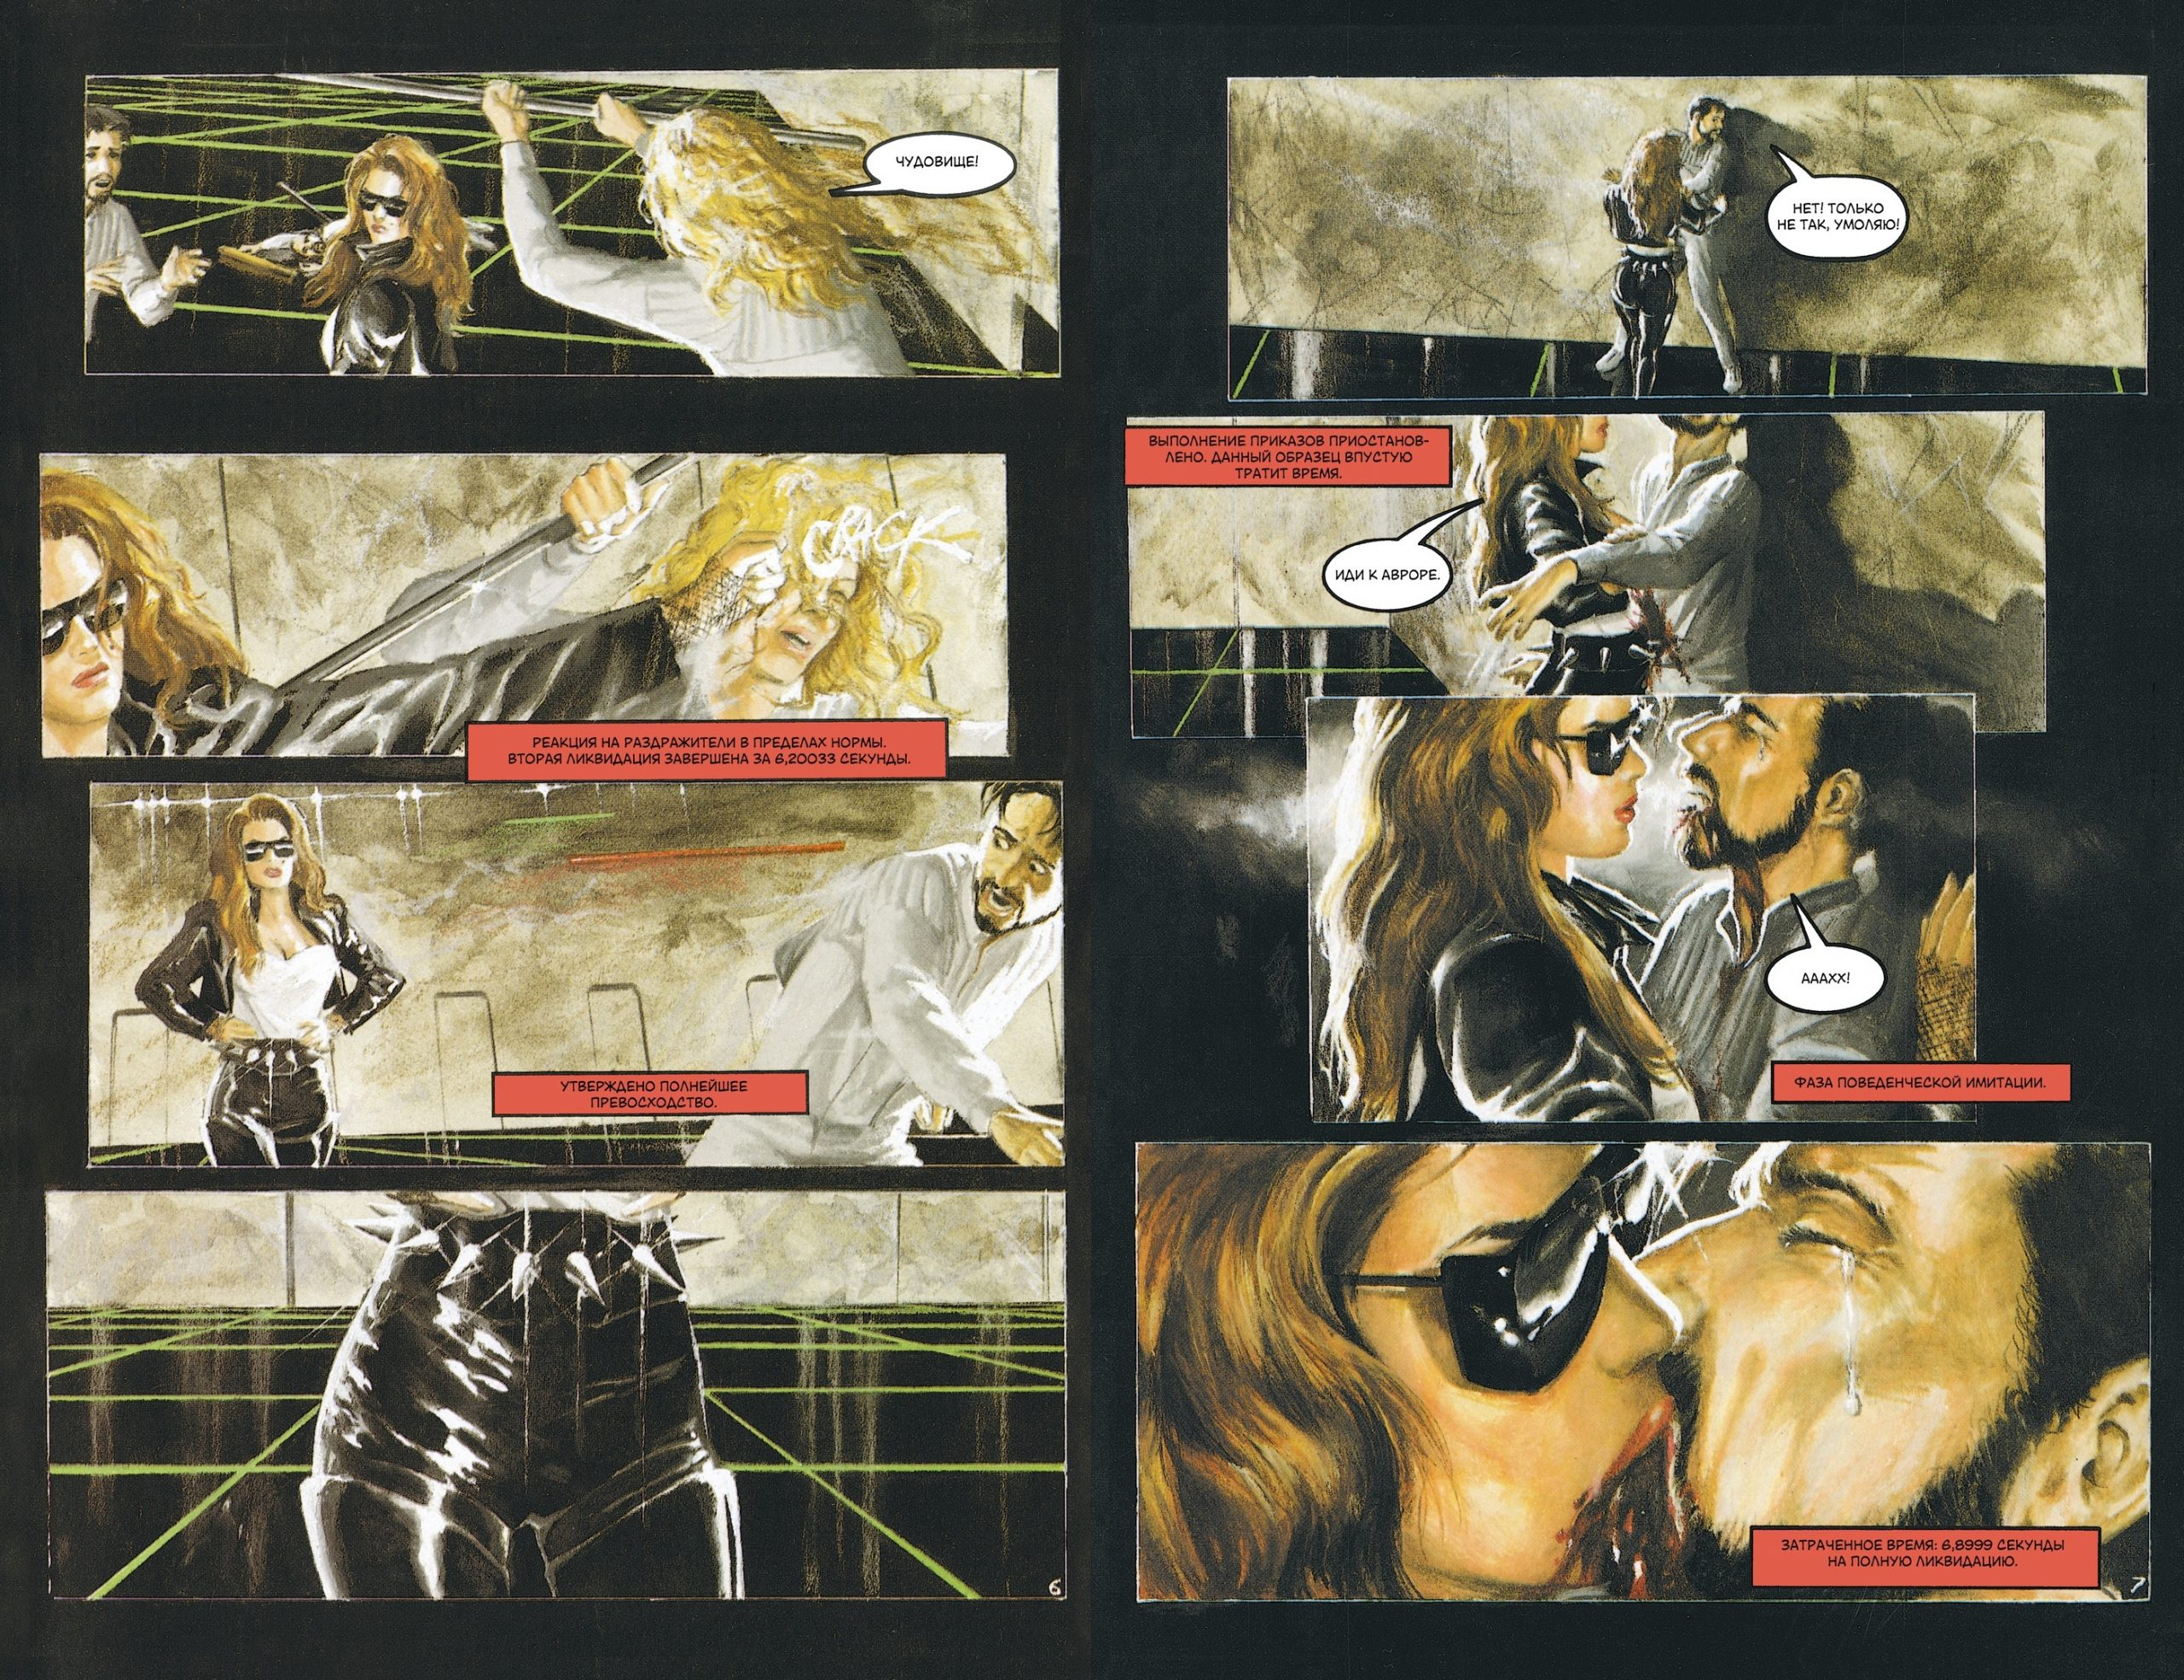 НаCrowdRepublic продолжается сбор средств наиздание комикса про«Терминатора» 3